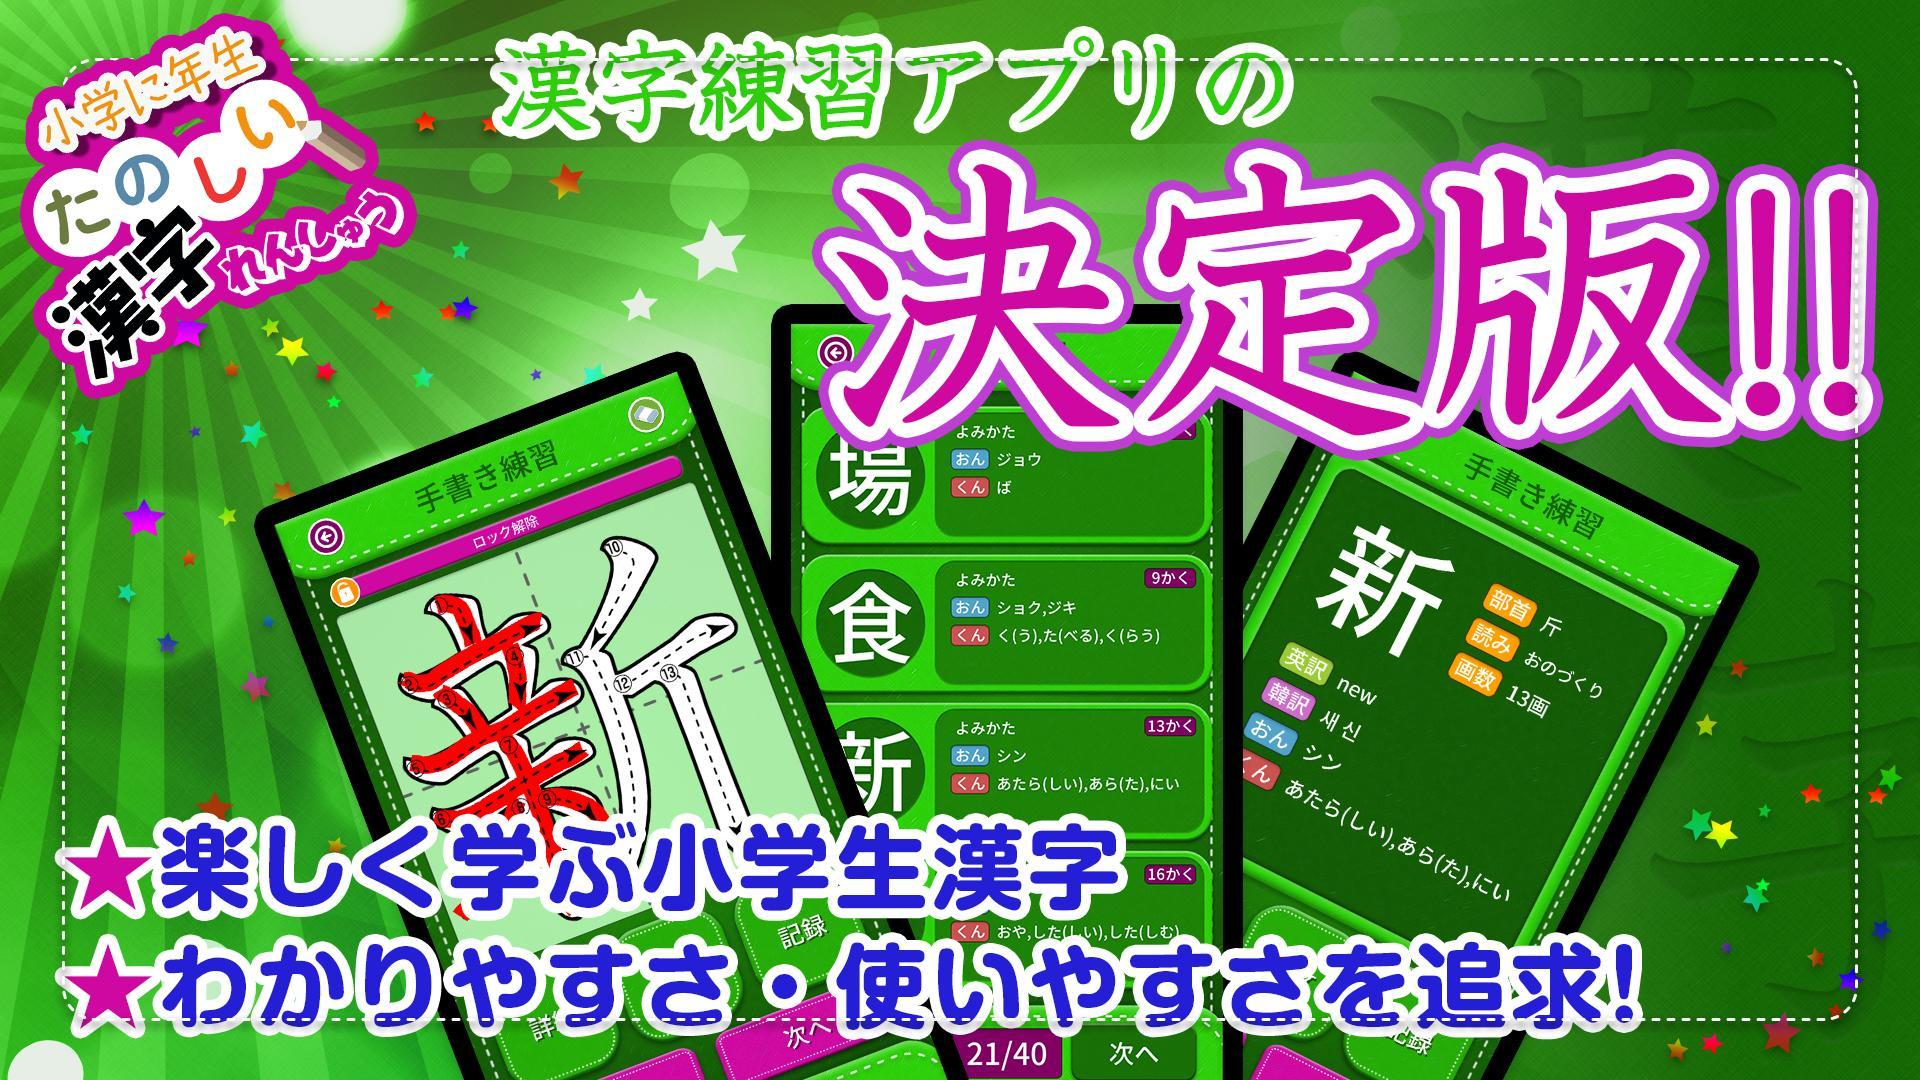 Android 用の 小学2年生漢字練習ドリル無料小学生漢字 Apk を